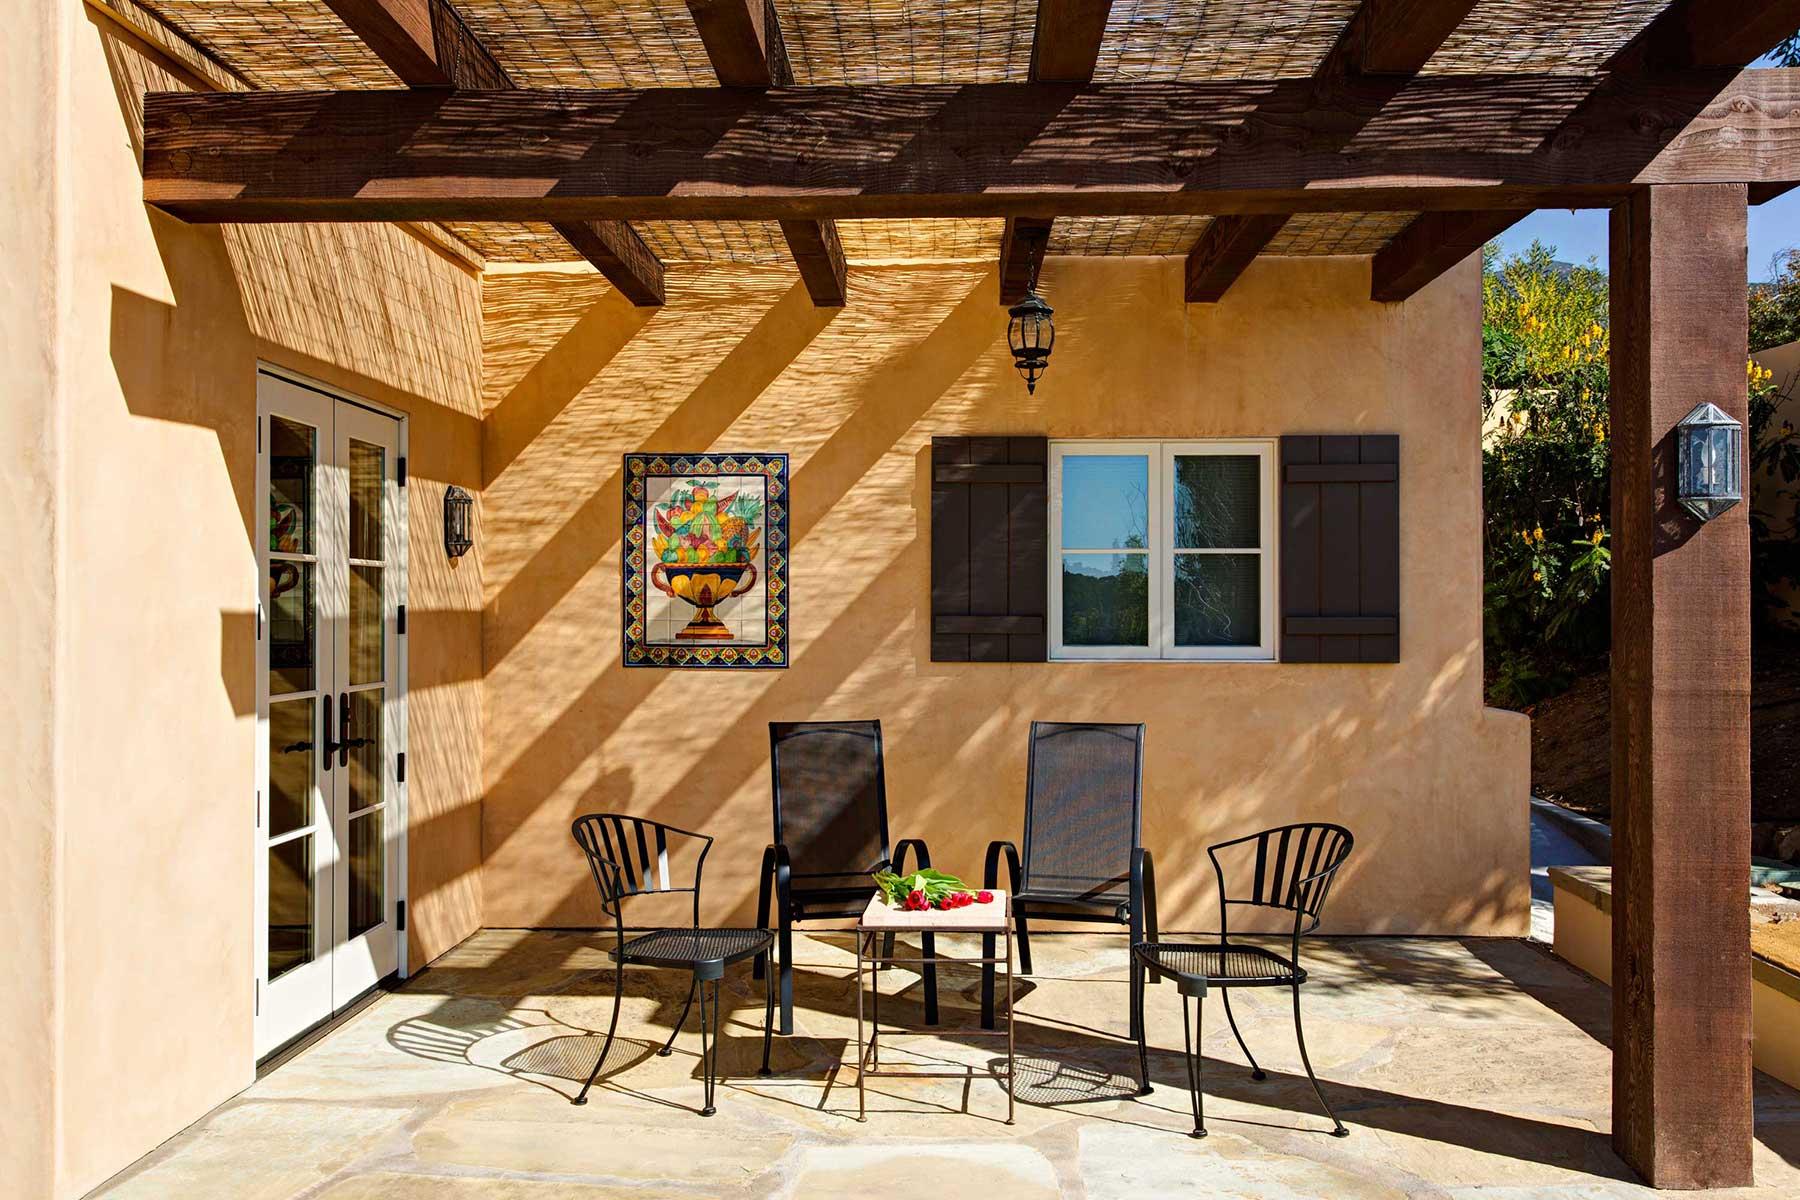 Gordobe_Homes_Coyote-Rd-exterior_patio